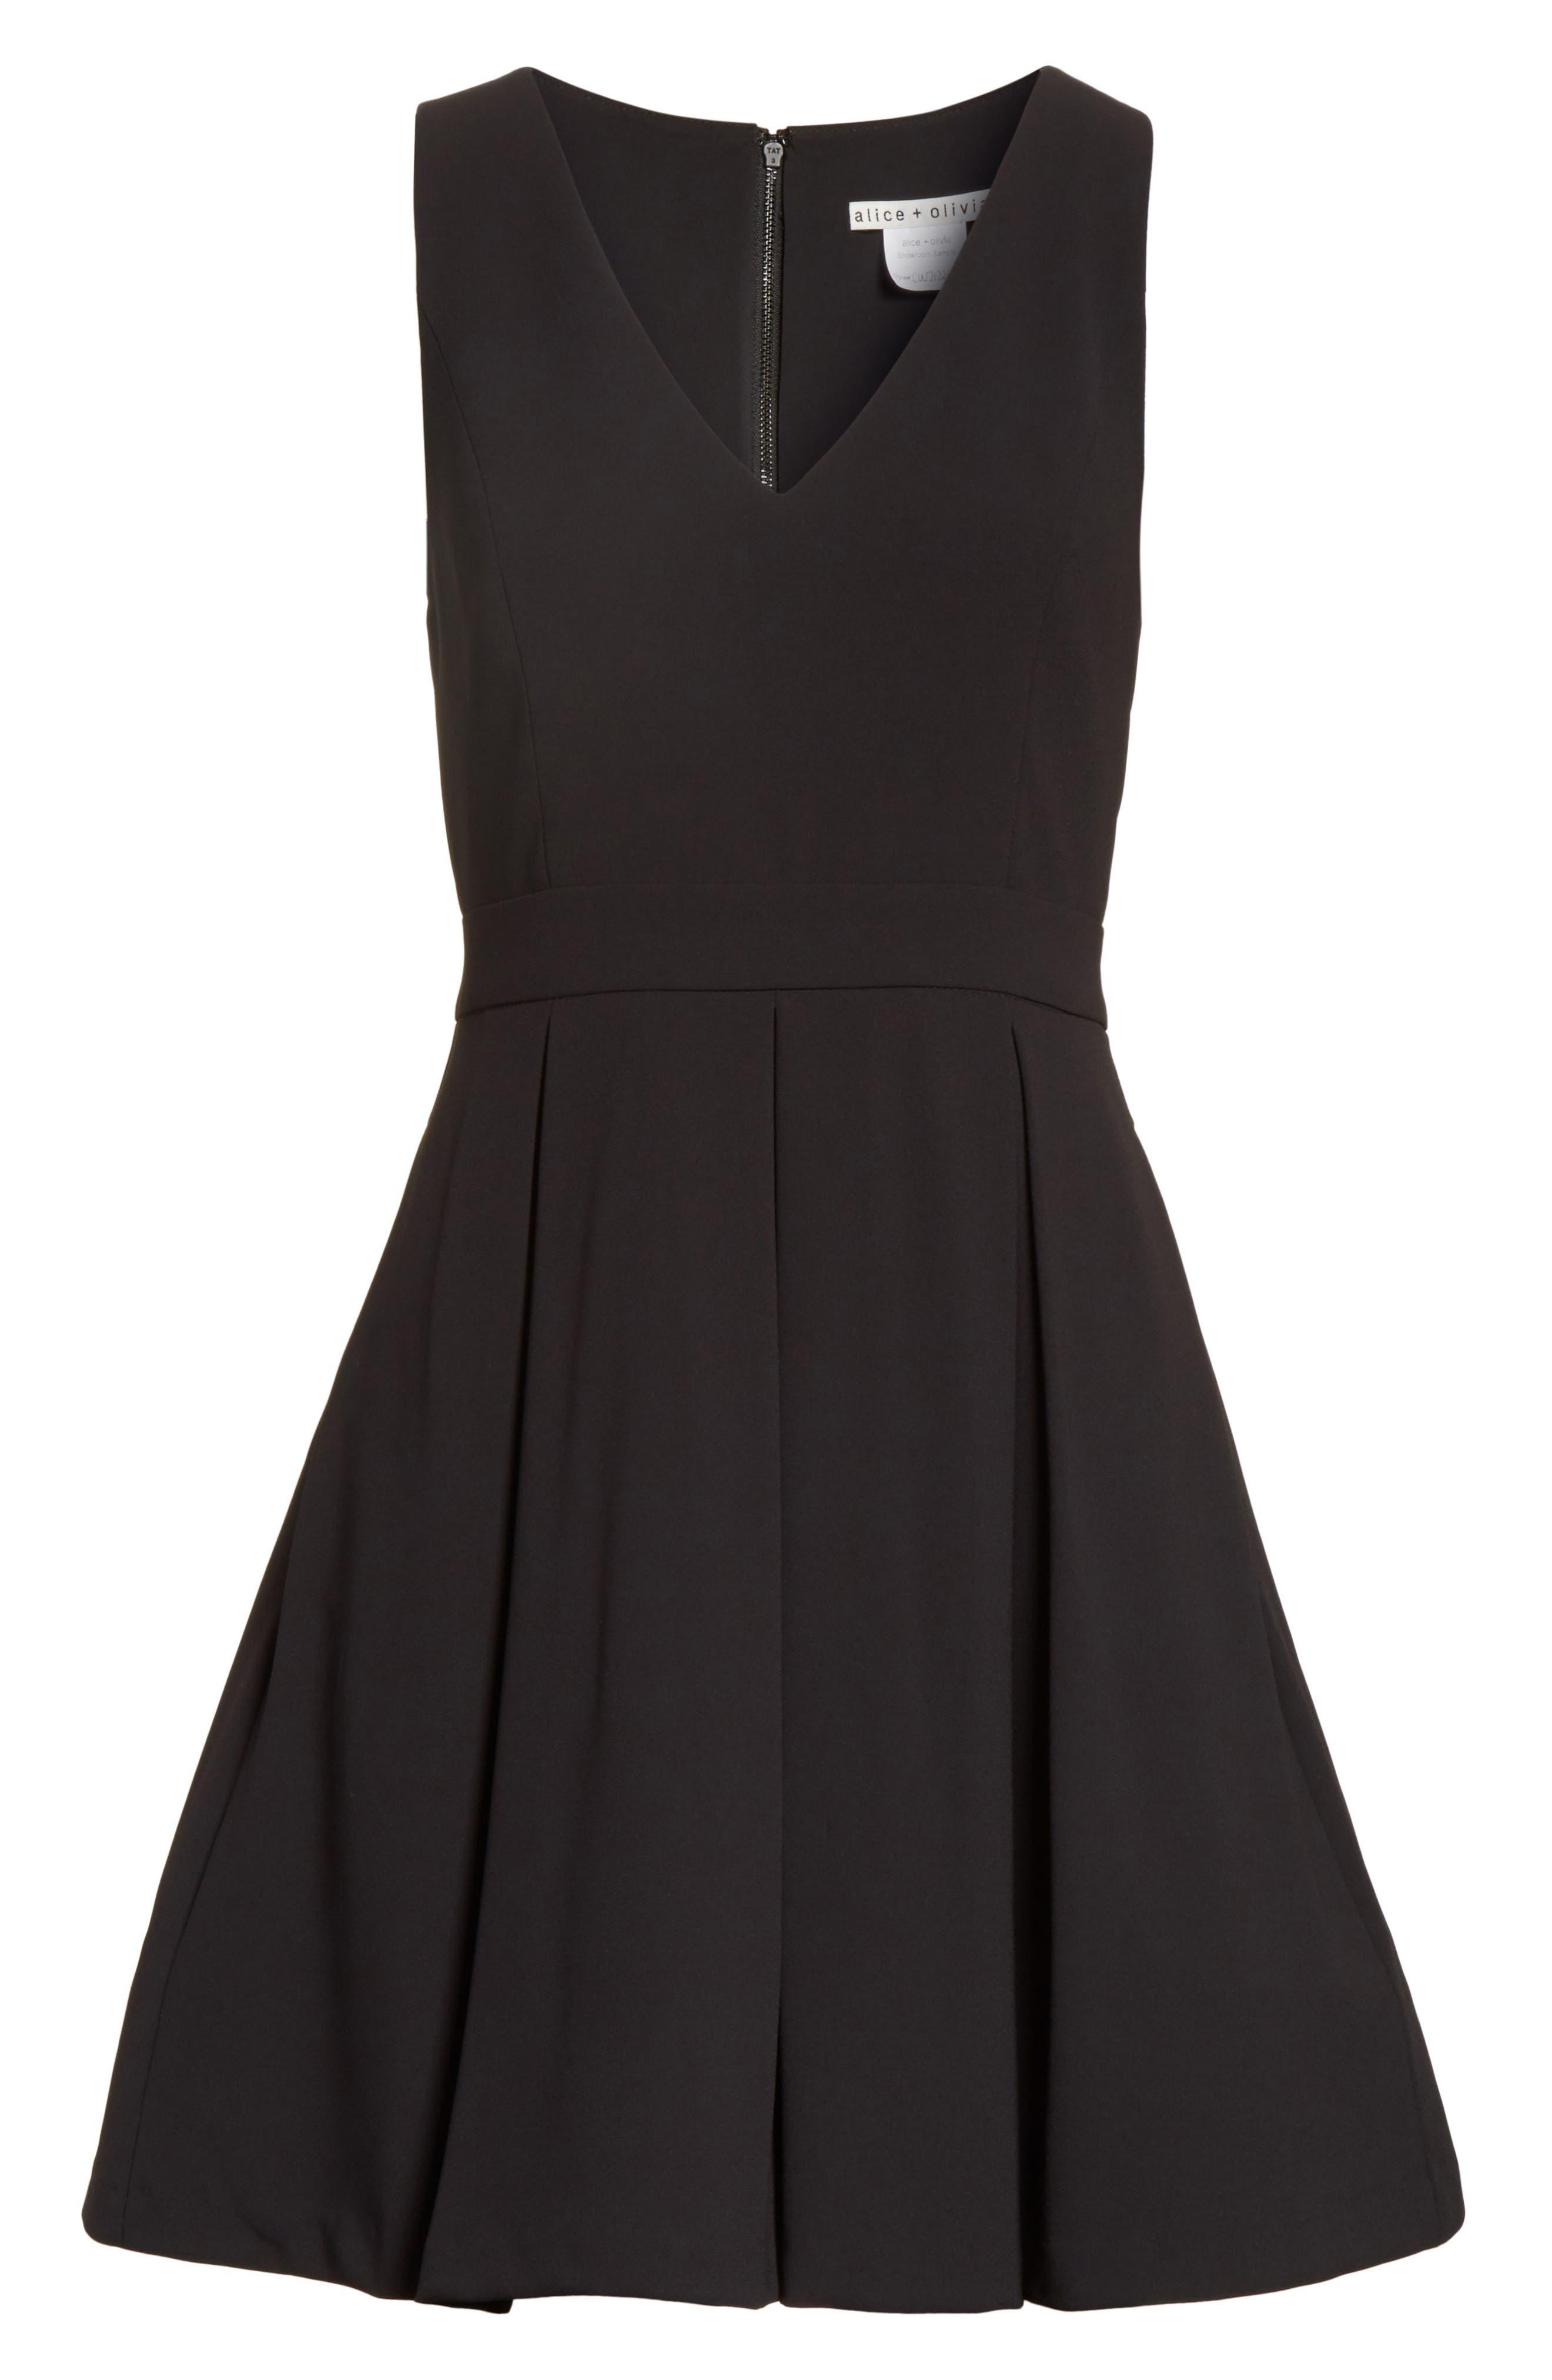 Julieta Inverted Pleat Fit & Flare Dress,                             Alternate thumbnail 6, color,                             Black